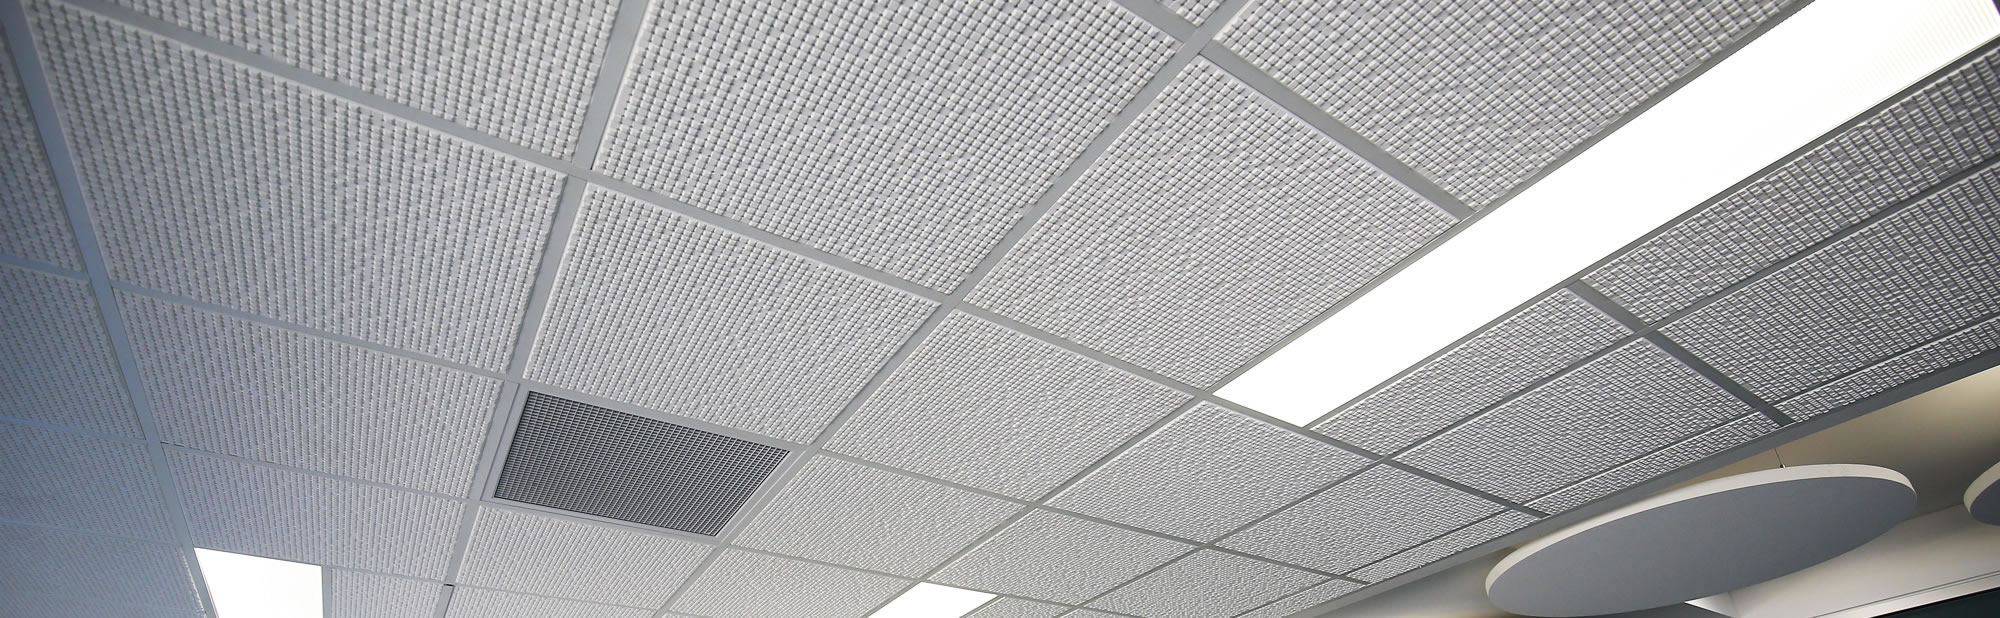 Shadex Acoustic Ceiling Tiles Australian Plaster Acoustics